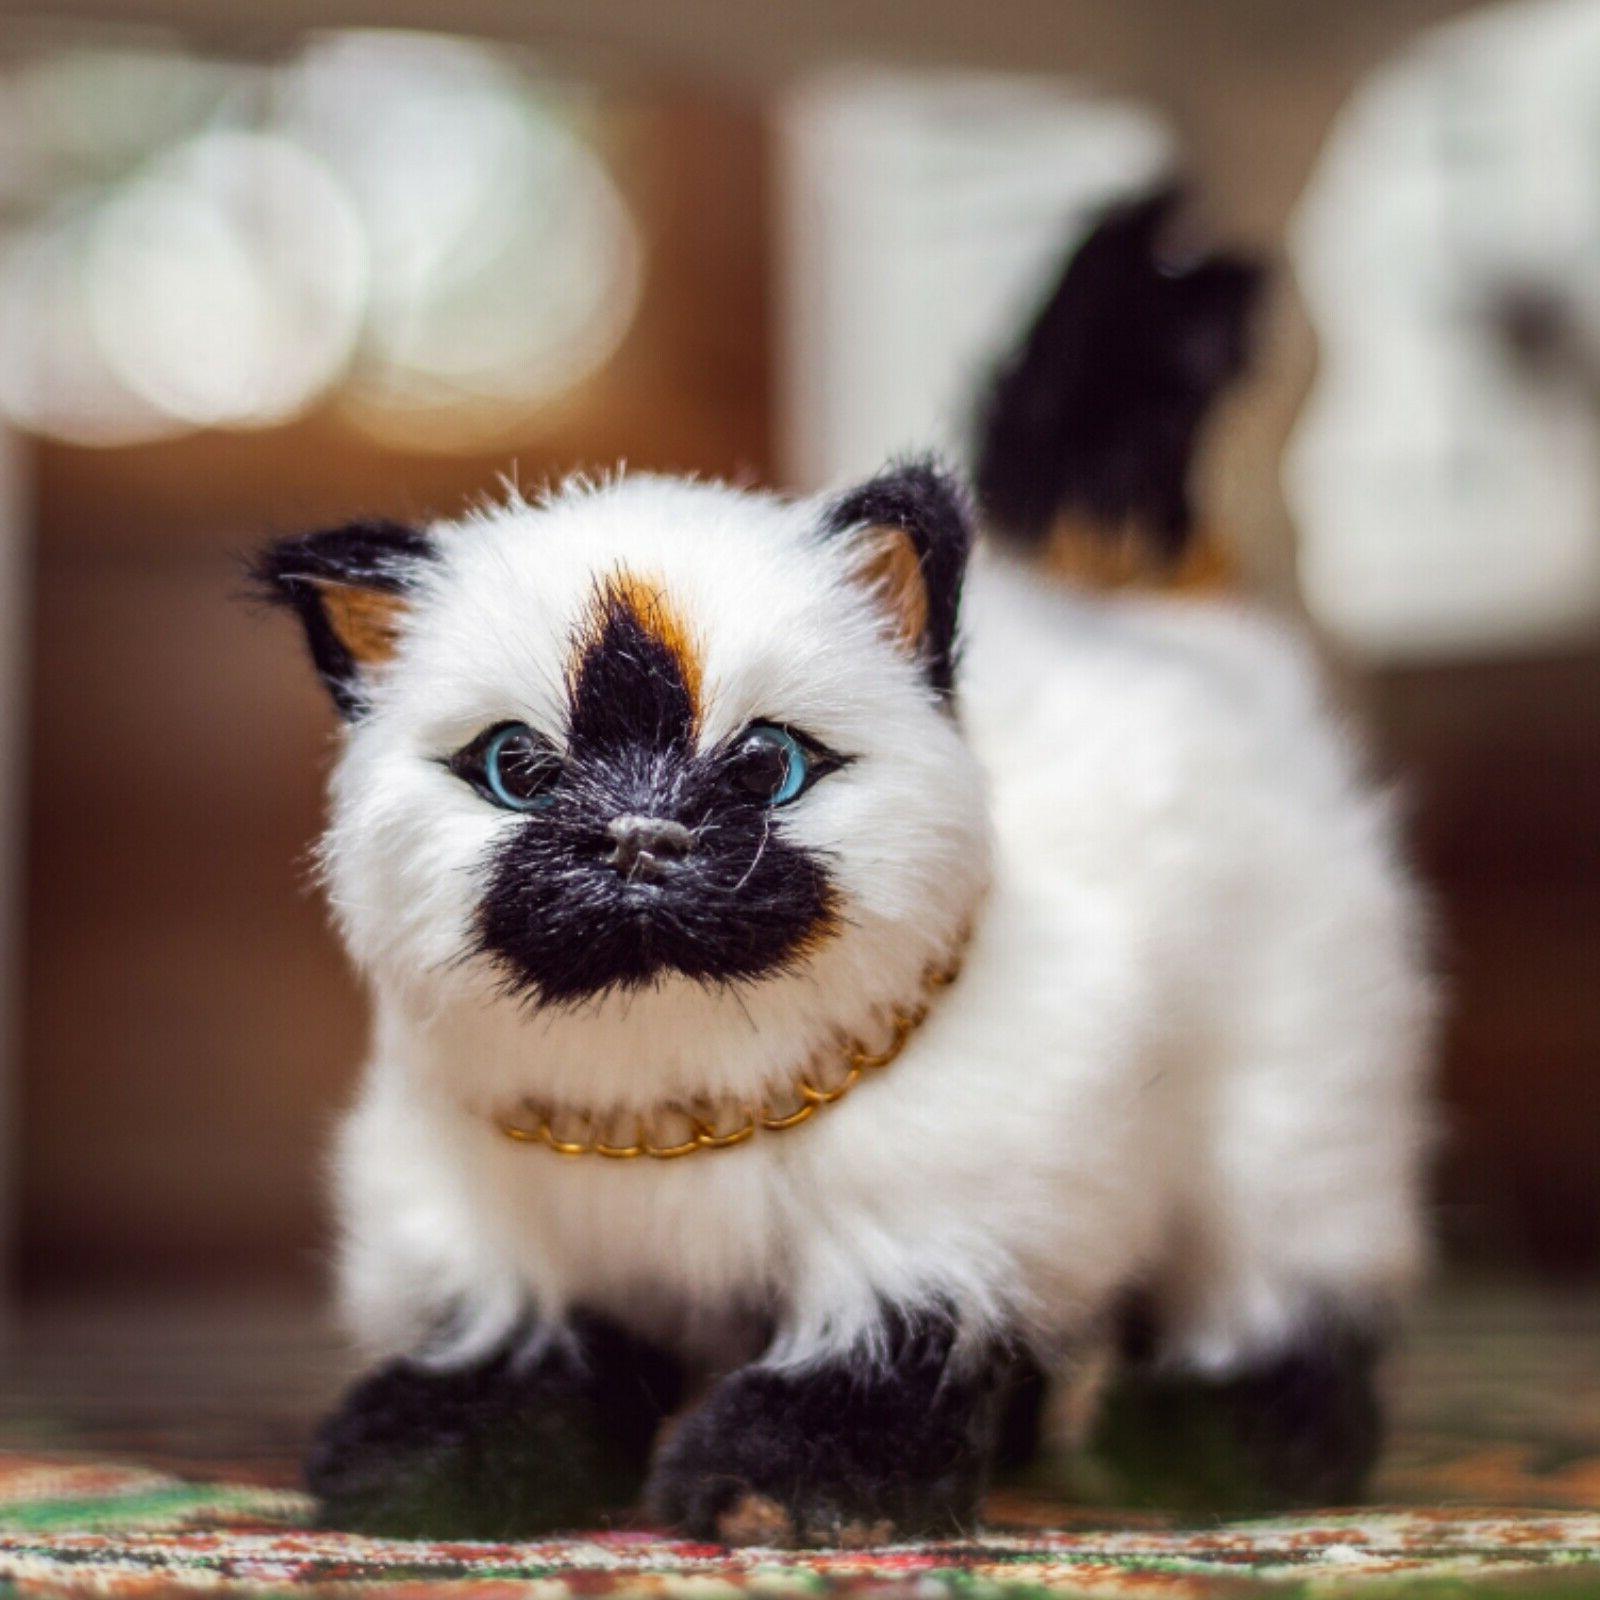 Pets 18 Inch Dolls, Set of Cat American Girl